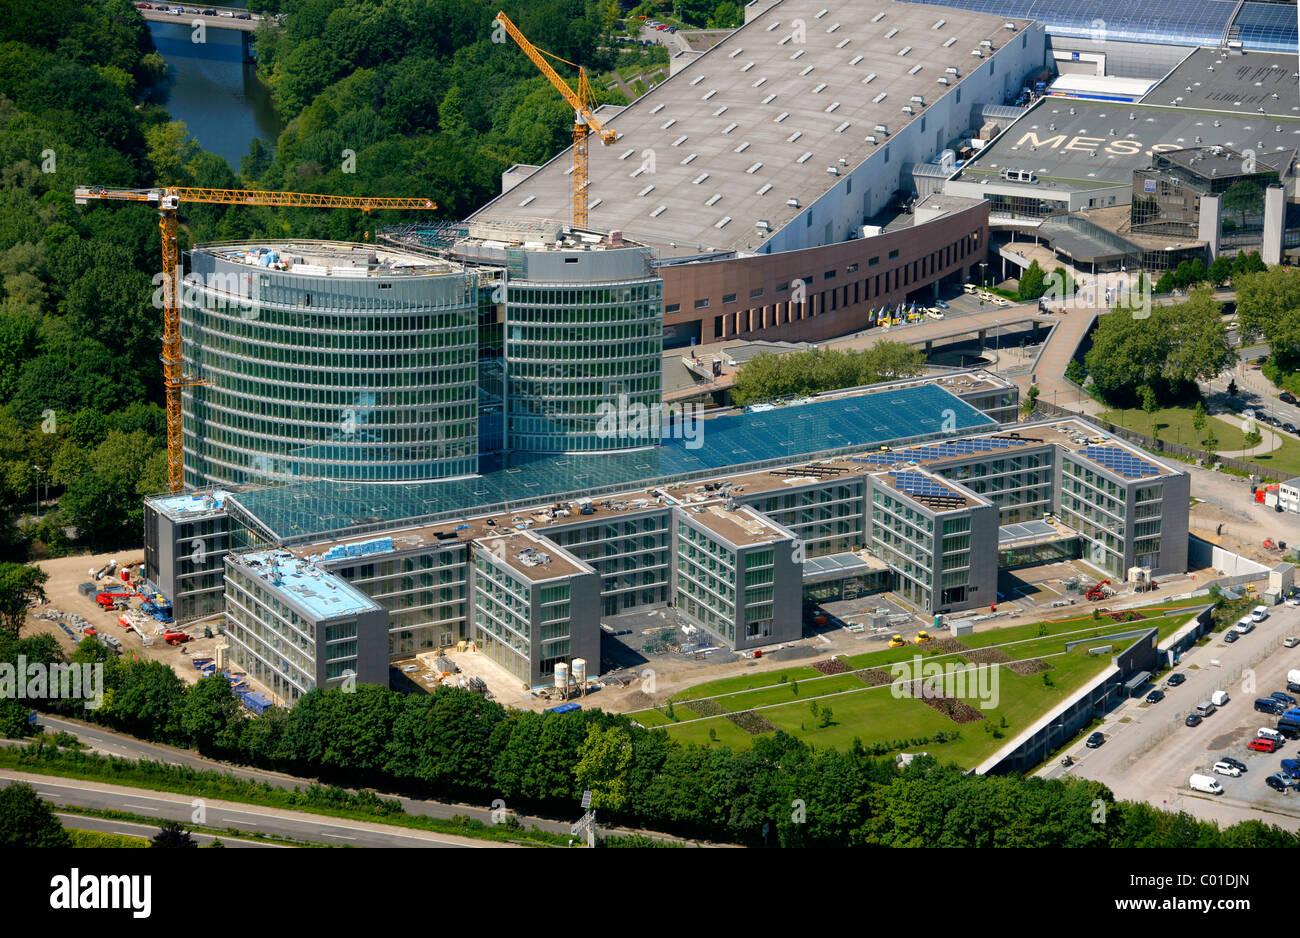 Aerial view, EON Ruhrgas energy corporation Headquarters Essen, Essen, Ruhrgebiet area, North Rhine-Westphalia, - Stock Image